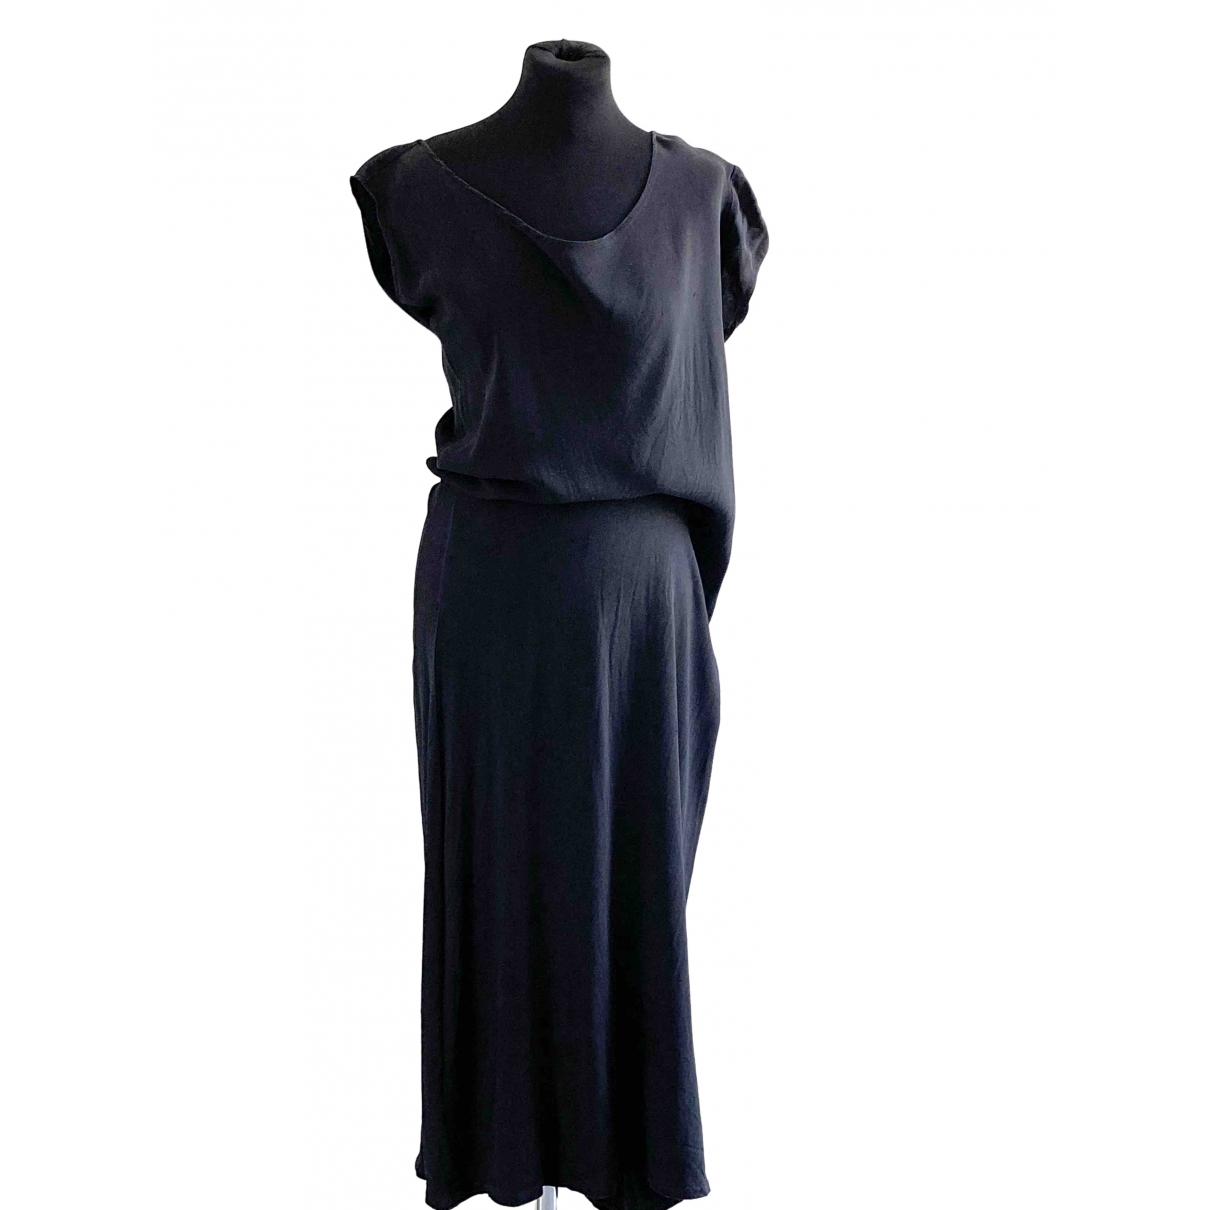 Ann Demeulemeester \N Kleid in  Anthrazit Seide